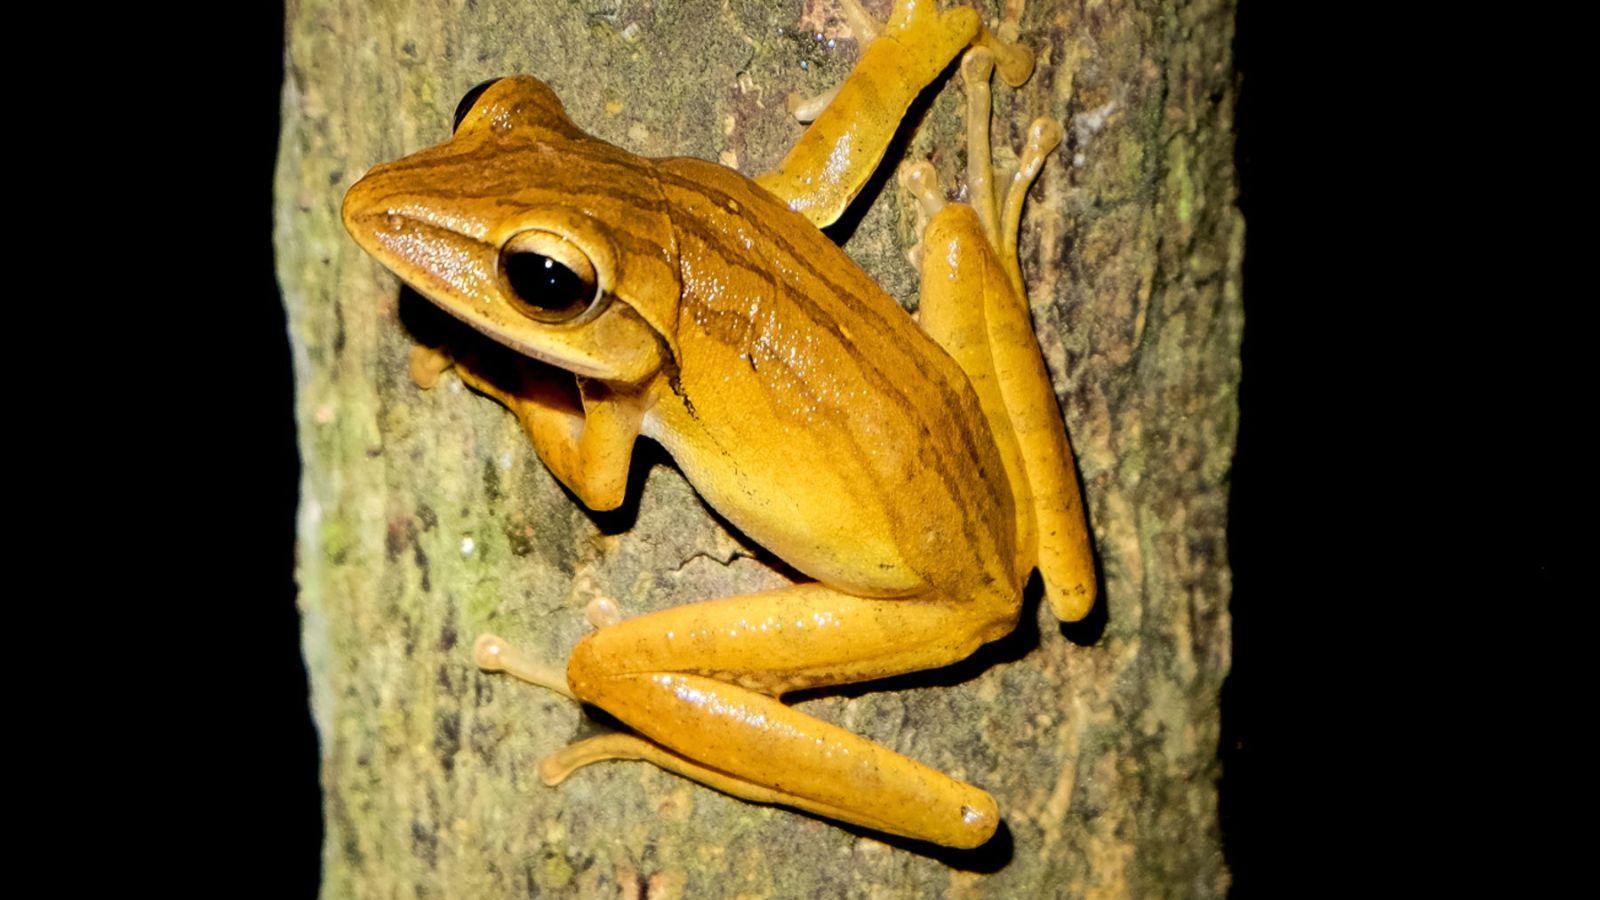 a photo of a climbing frog in gunung leuser national park.